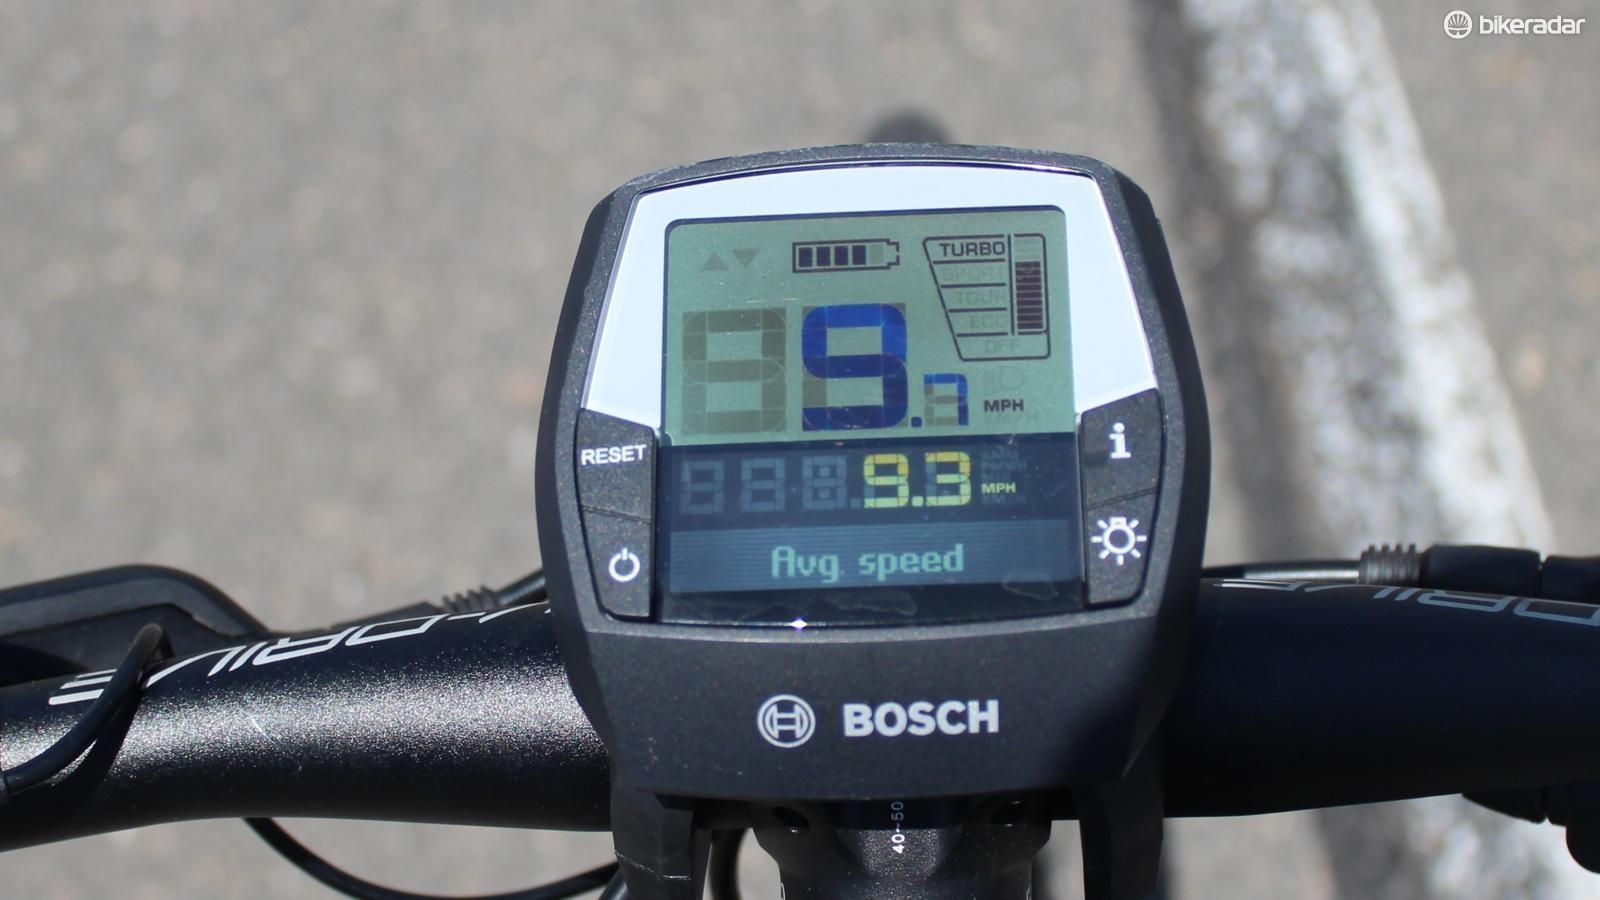 E-bike power: throttle vs pedal-assist - BikeRadar